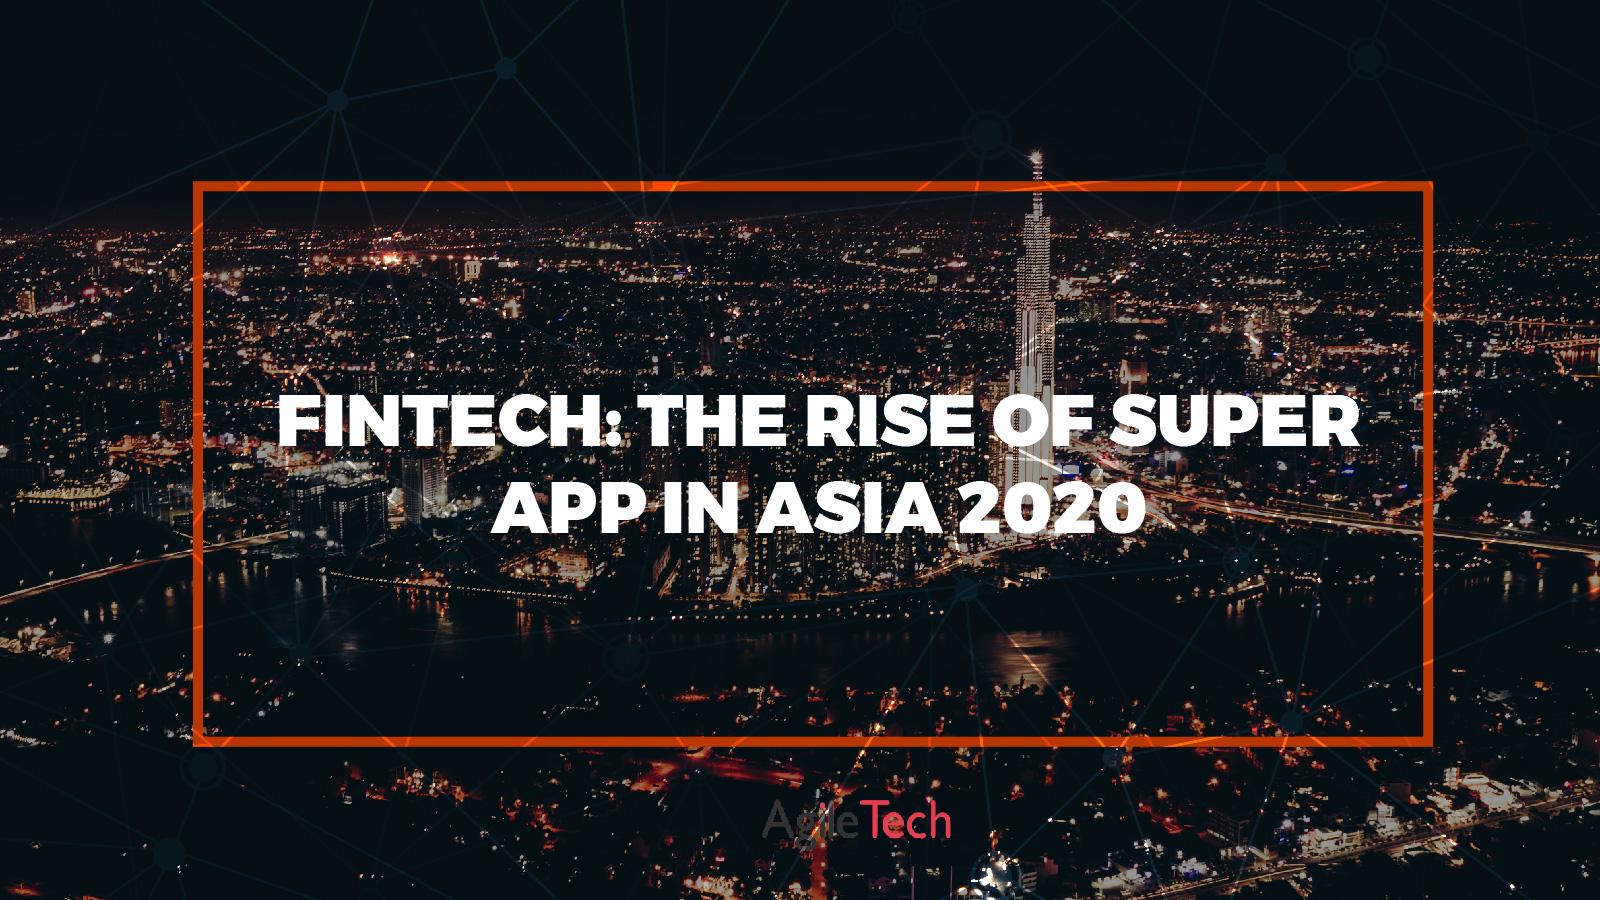 fintech the rise of super app in asia 2020 agiletech